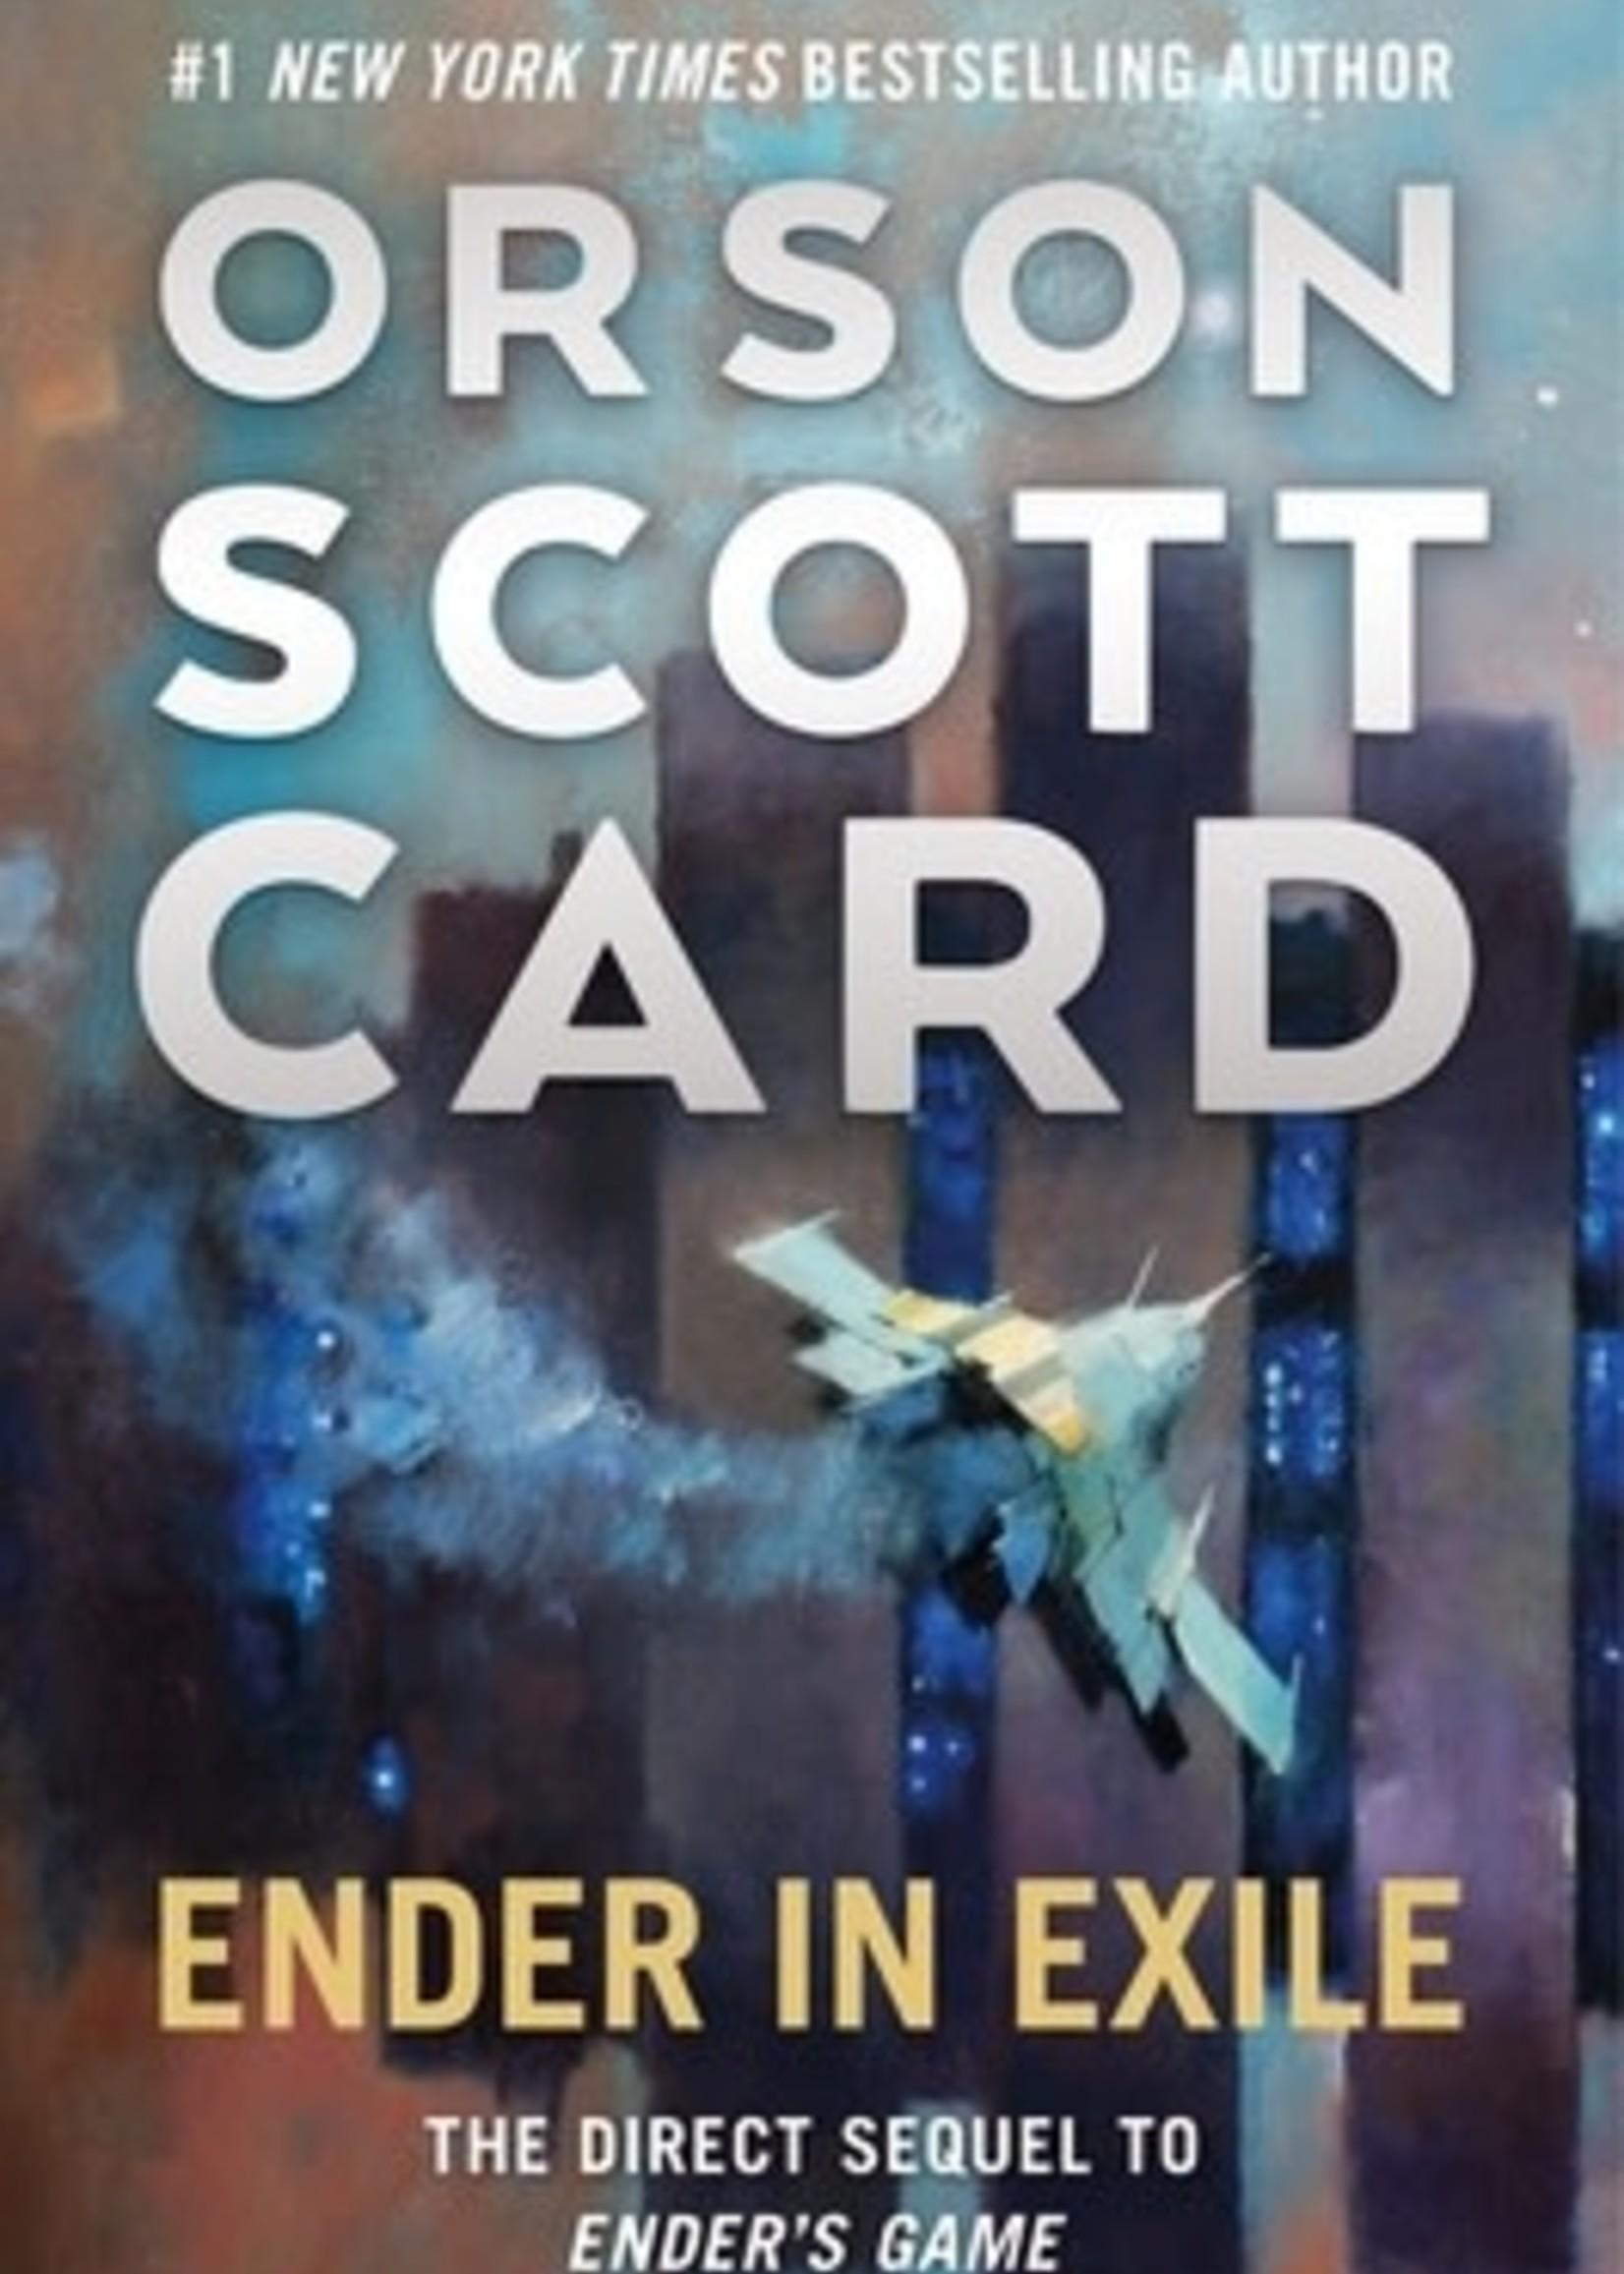 Ender in Exile (Ender's Game #2) by Orson Scott Card